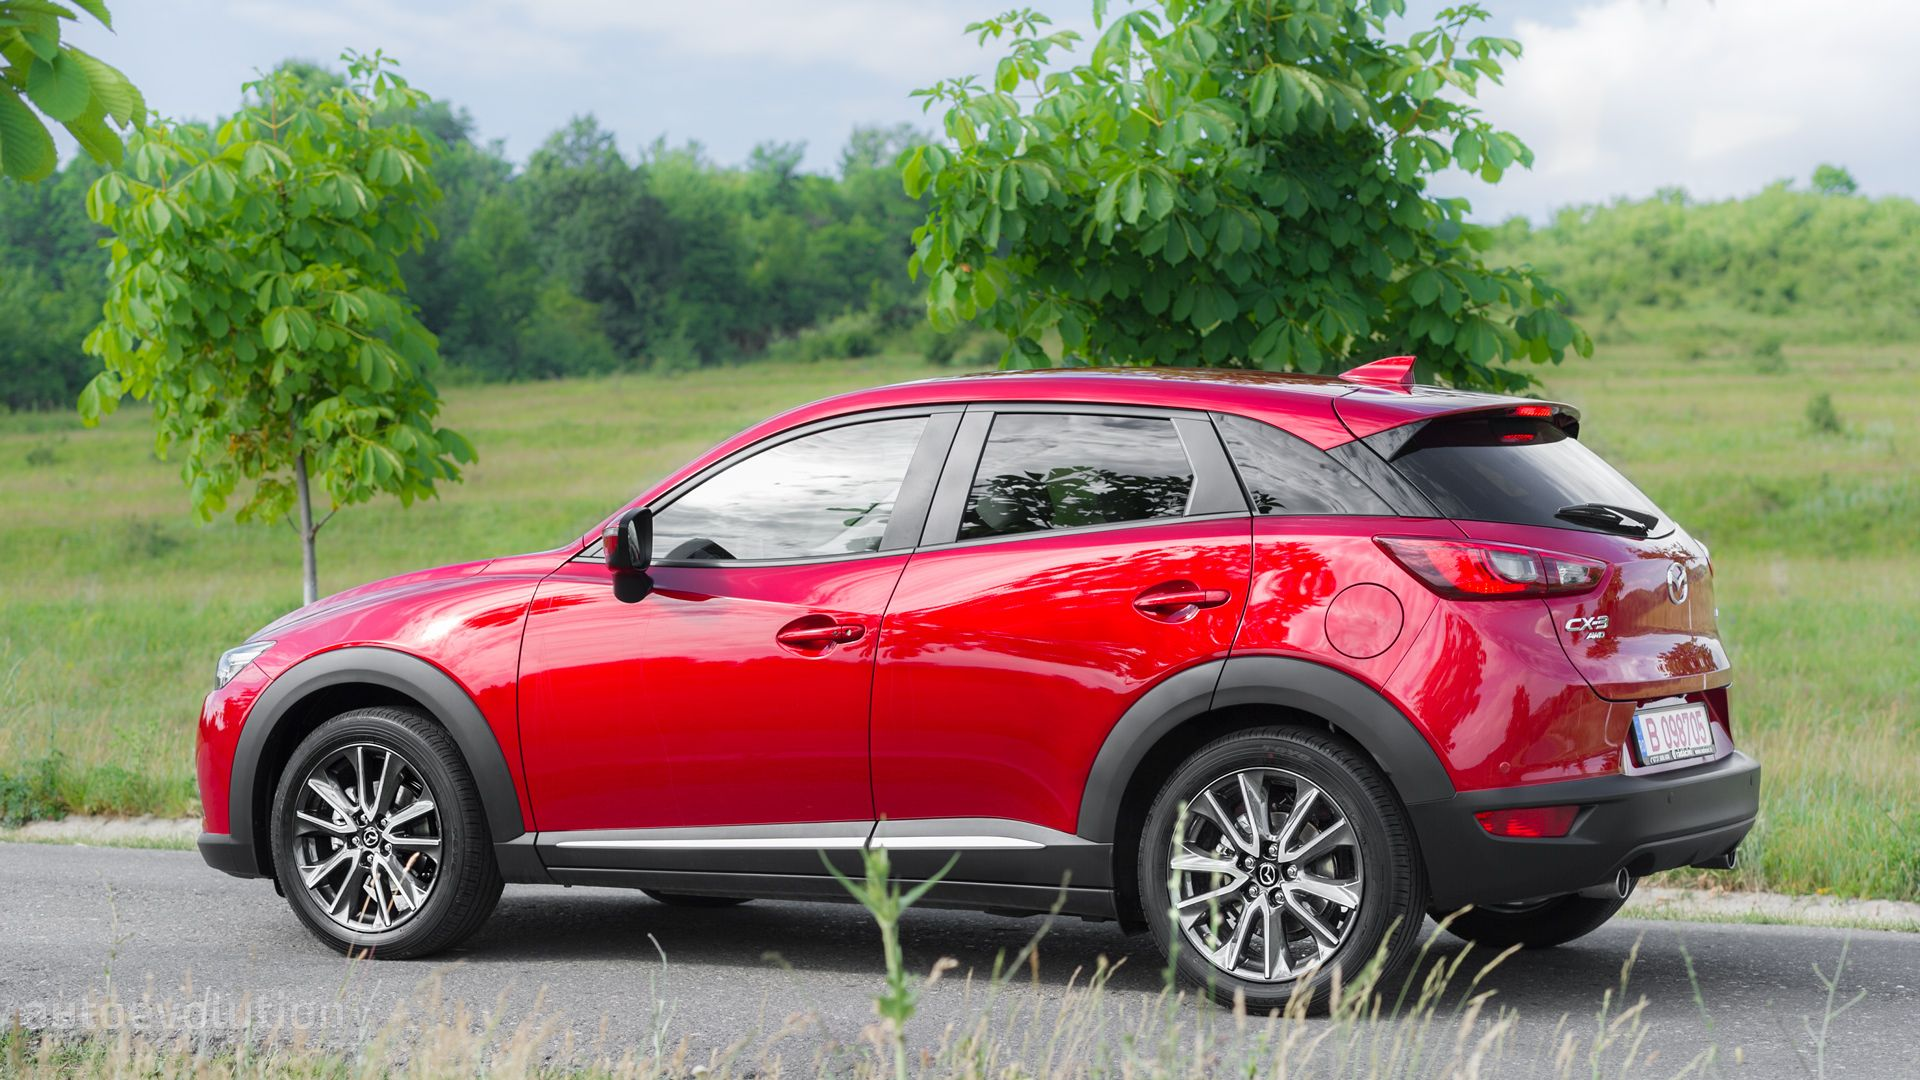 2015 Mazda Cx 3 Hd Wallpapers Kodo Lady In Red Autoevolution